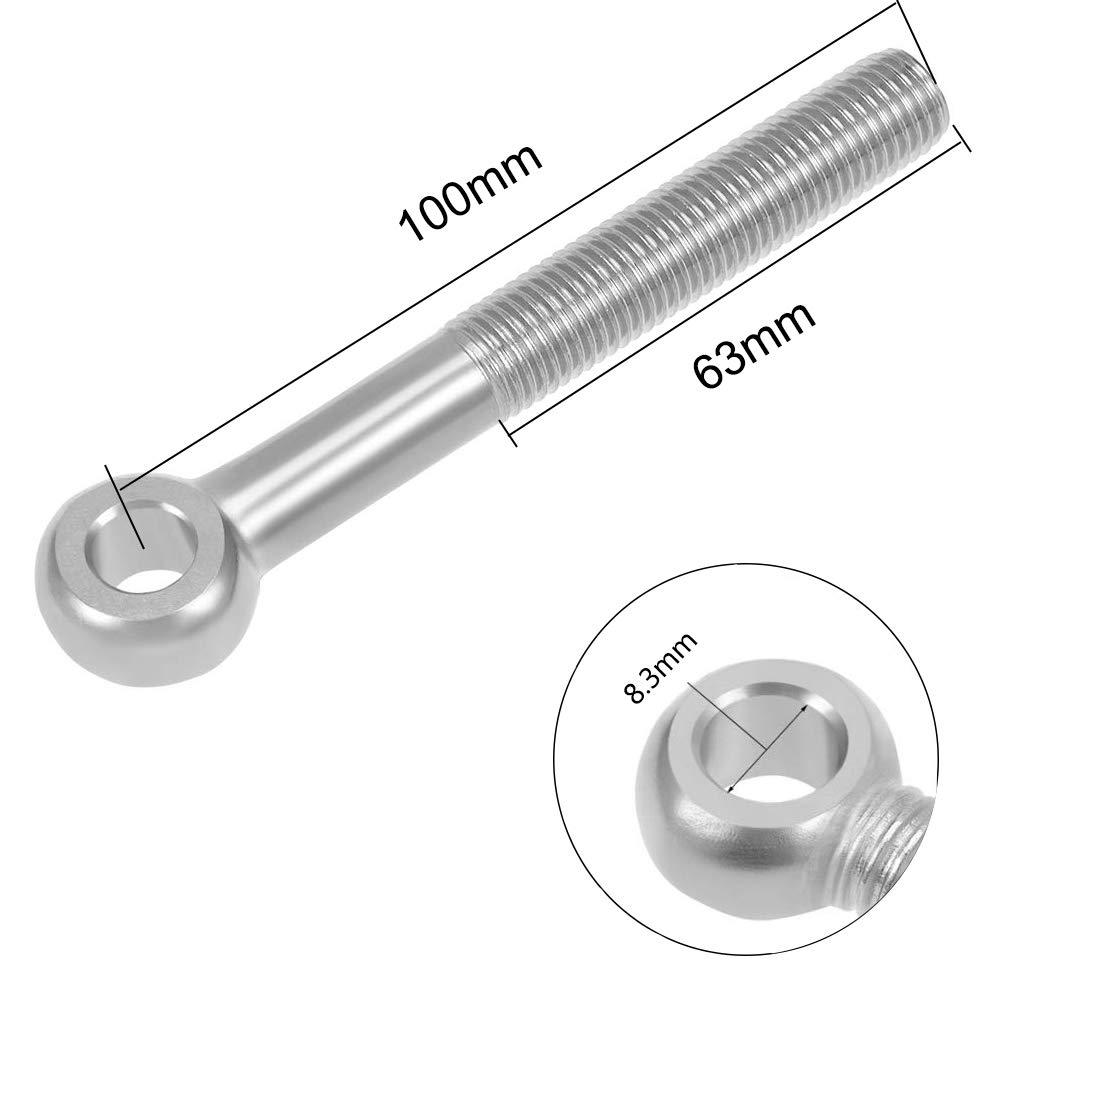 4Pcs YXQ M10x130mm Shoulder Machine Eye Bolts 304 Stainless Steel Machinery Lifting Screws Lift Rigging Silver Tone